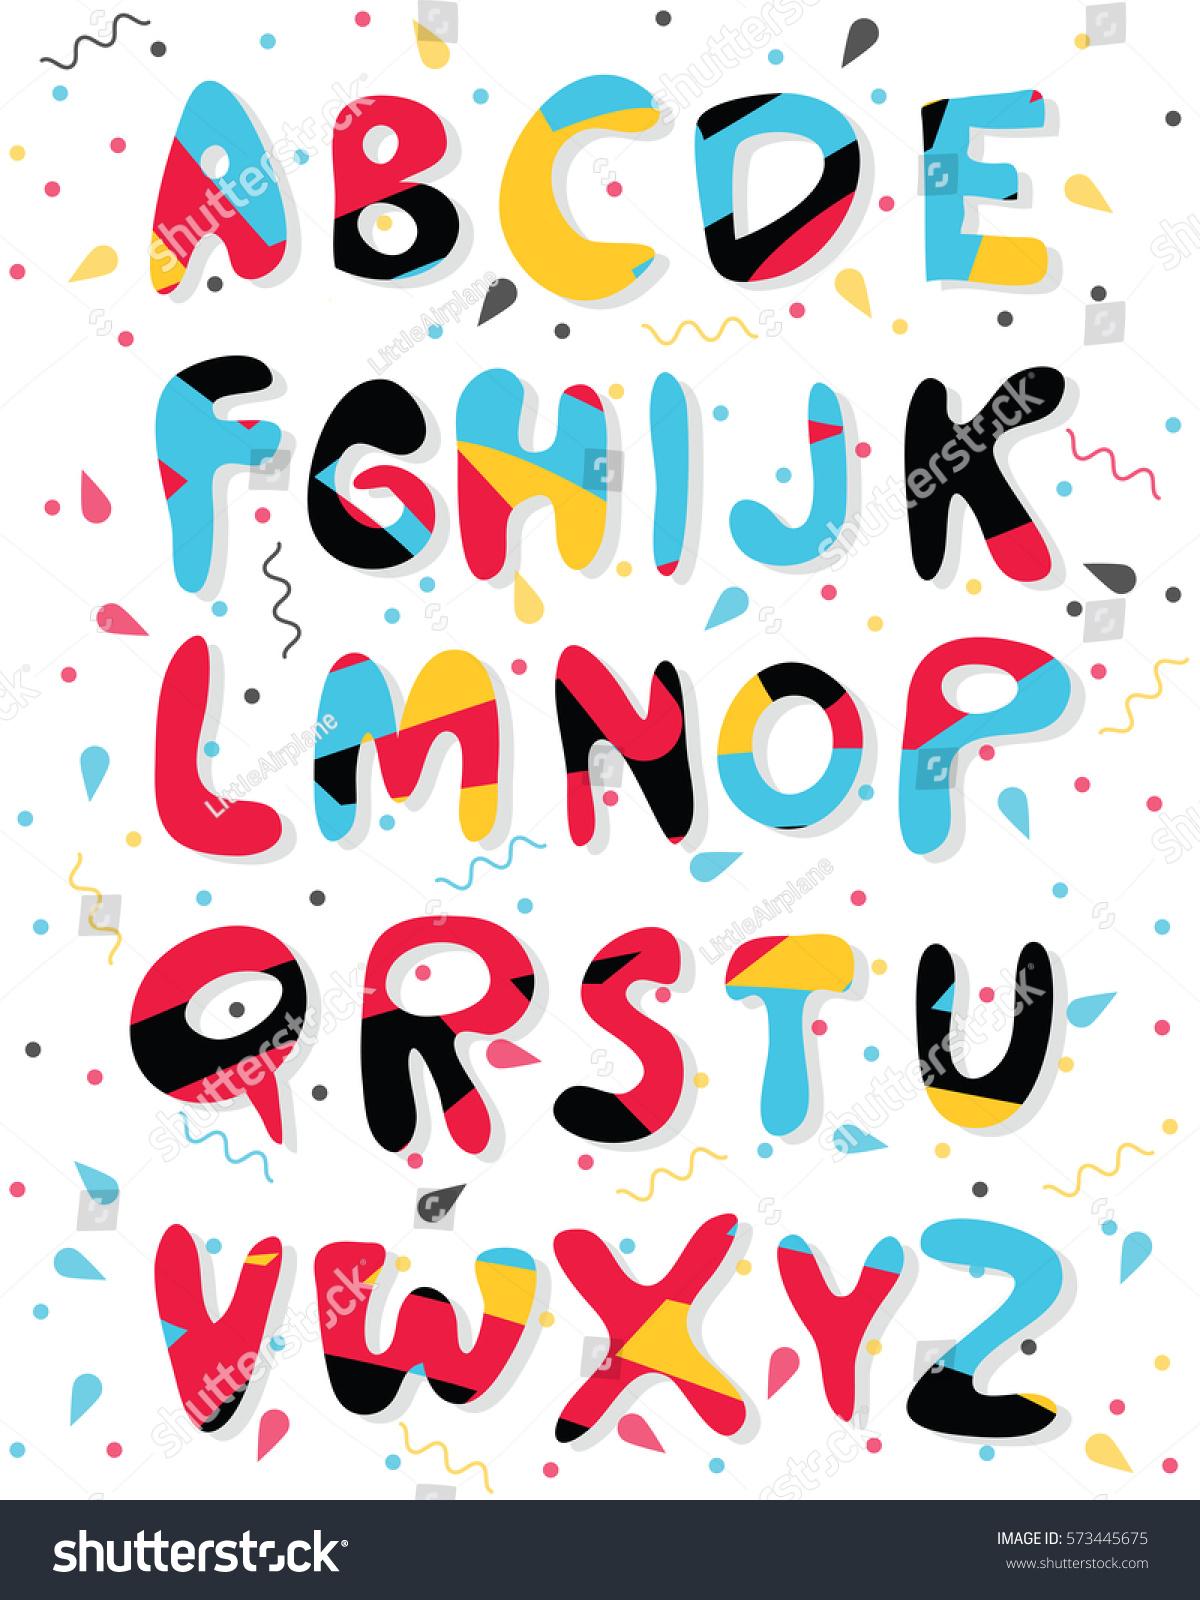 Graphic Design Letters Online